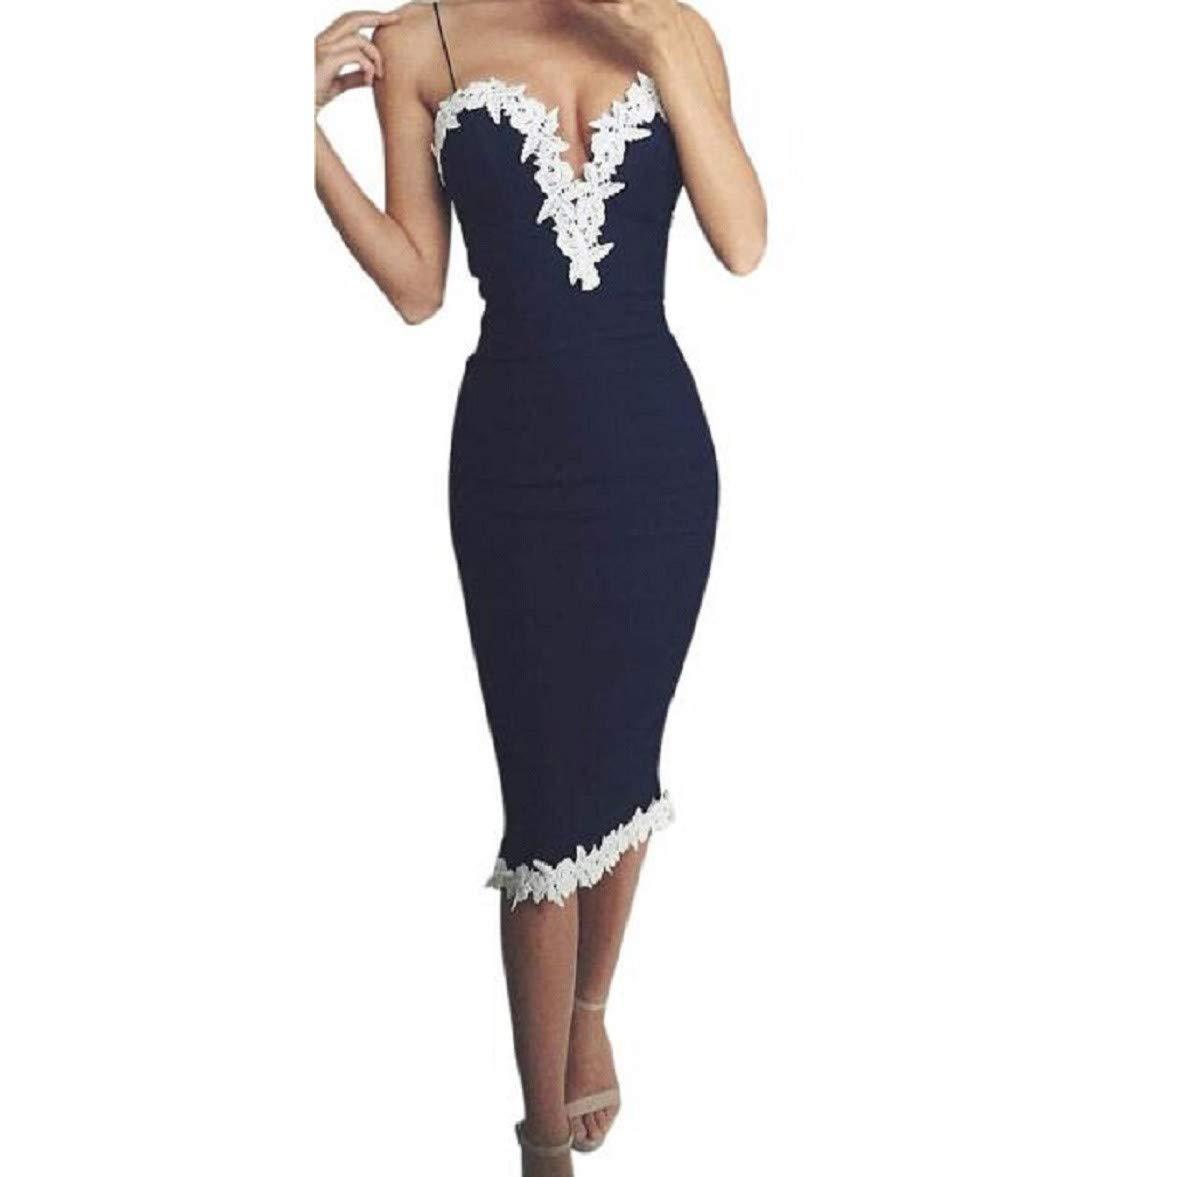 Knee Length Bodycon Dress for Women Elegant, Lace Edge Spaghetti Strap Cocktail Dress v-Neck Mini Dress Clubwear(Blue, S)